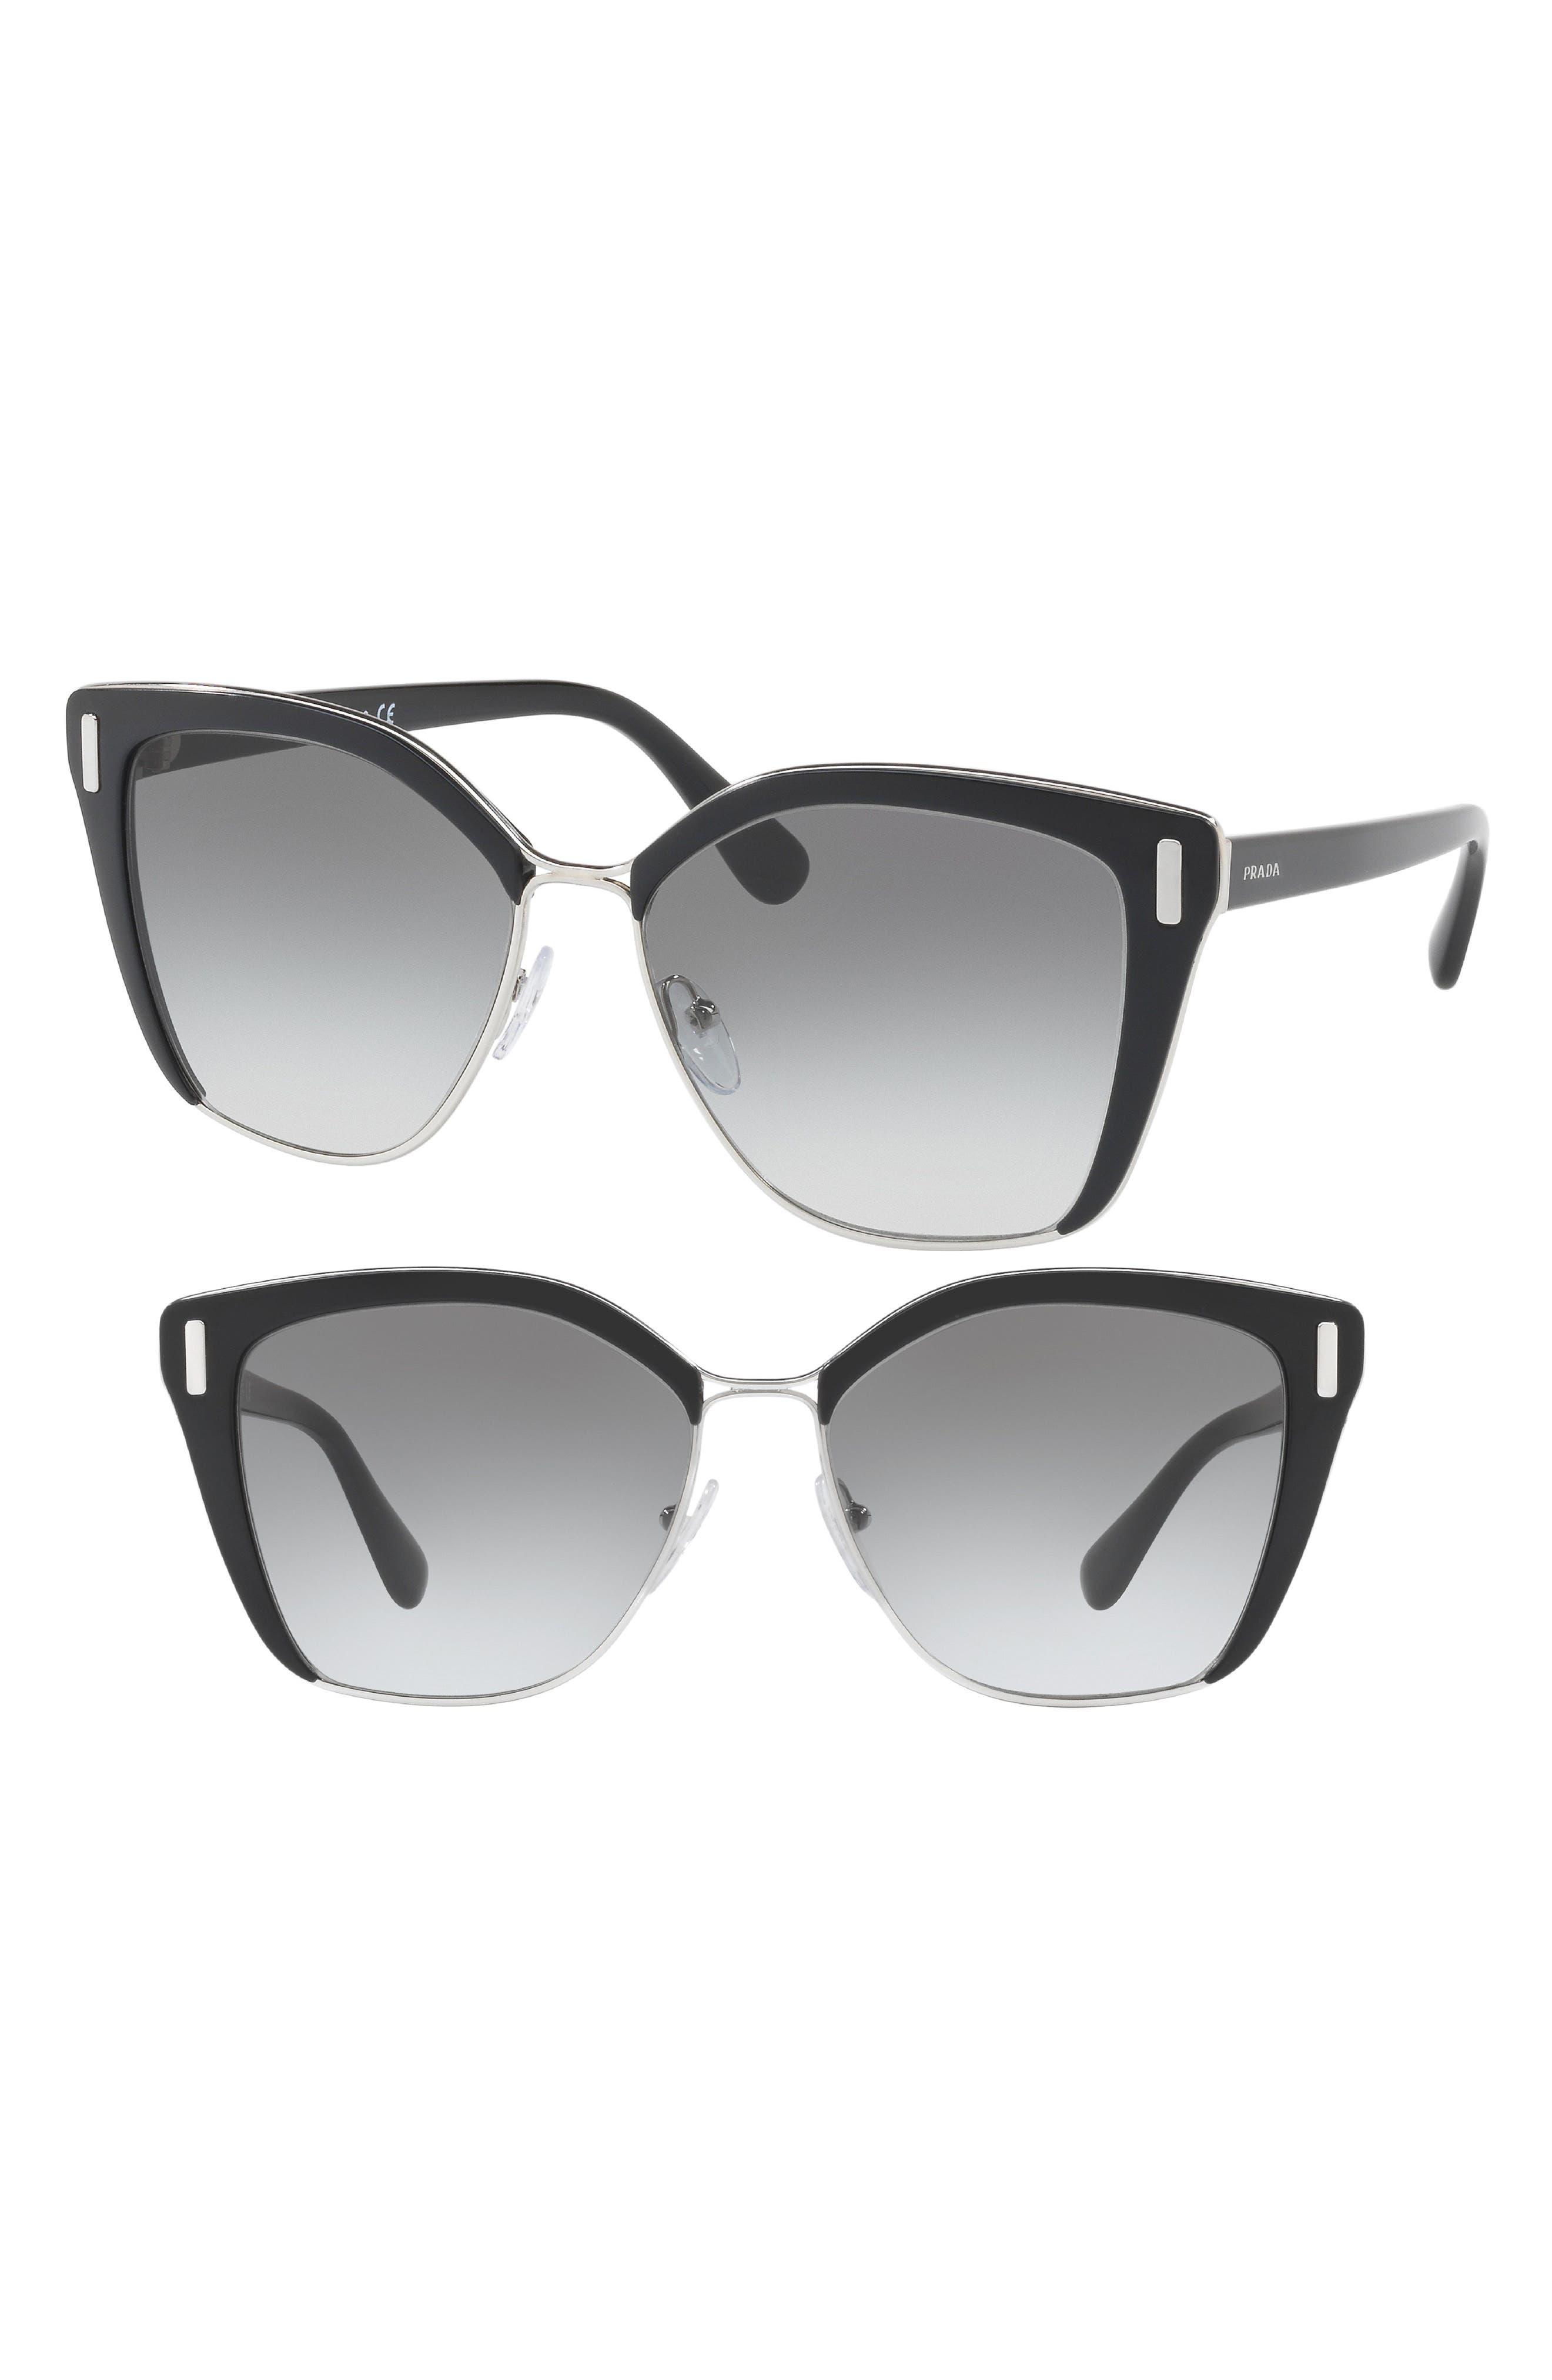 57mm Gradient Geometric Sunglasses,                         Main,                         color, 008